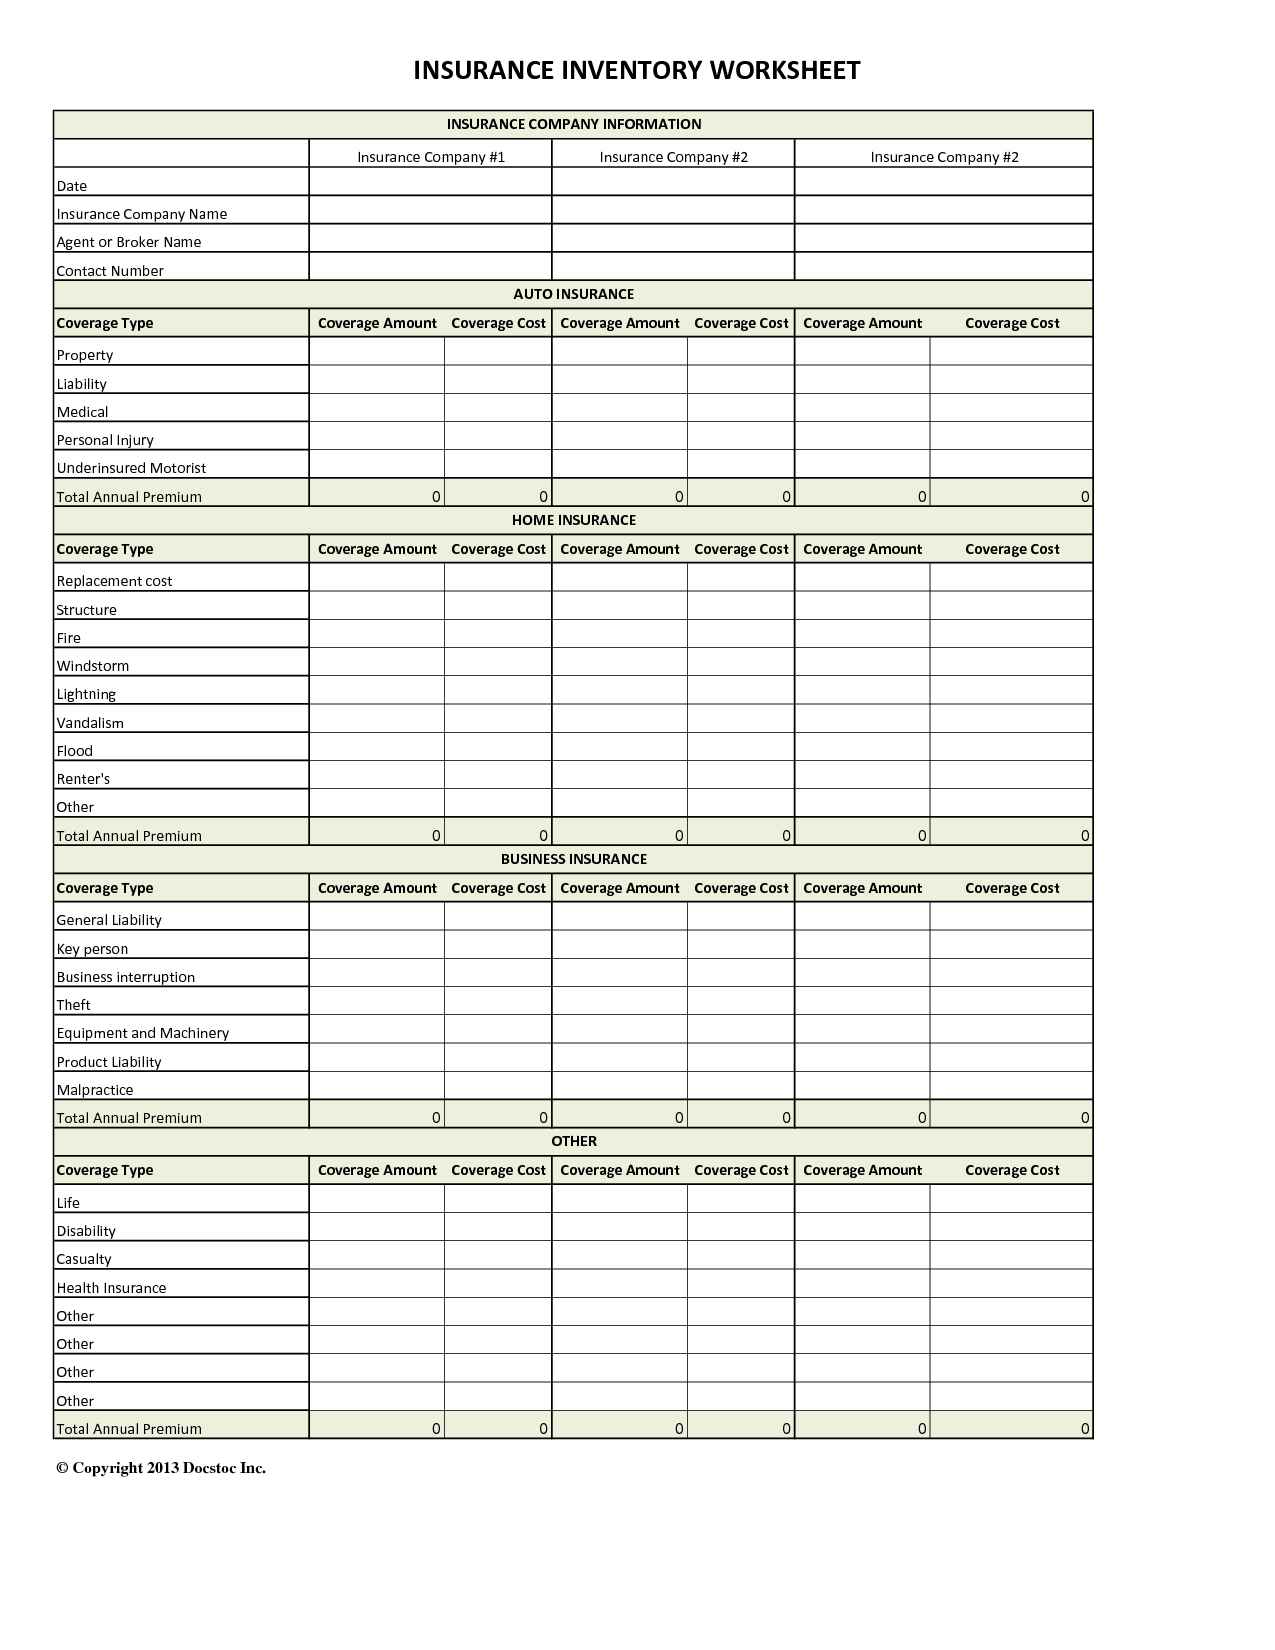 Health Insurance Comparison Spreadsheet On Excel Spreadsheet Merge To Health Insurance Comparison Spreadsheet